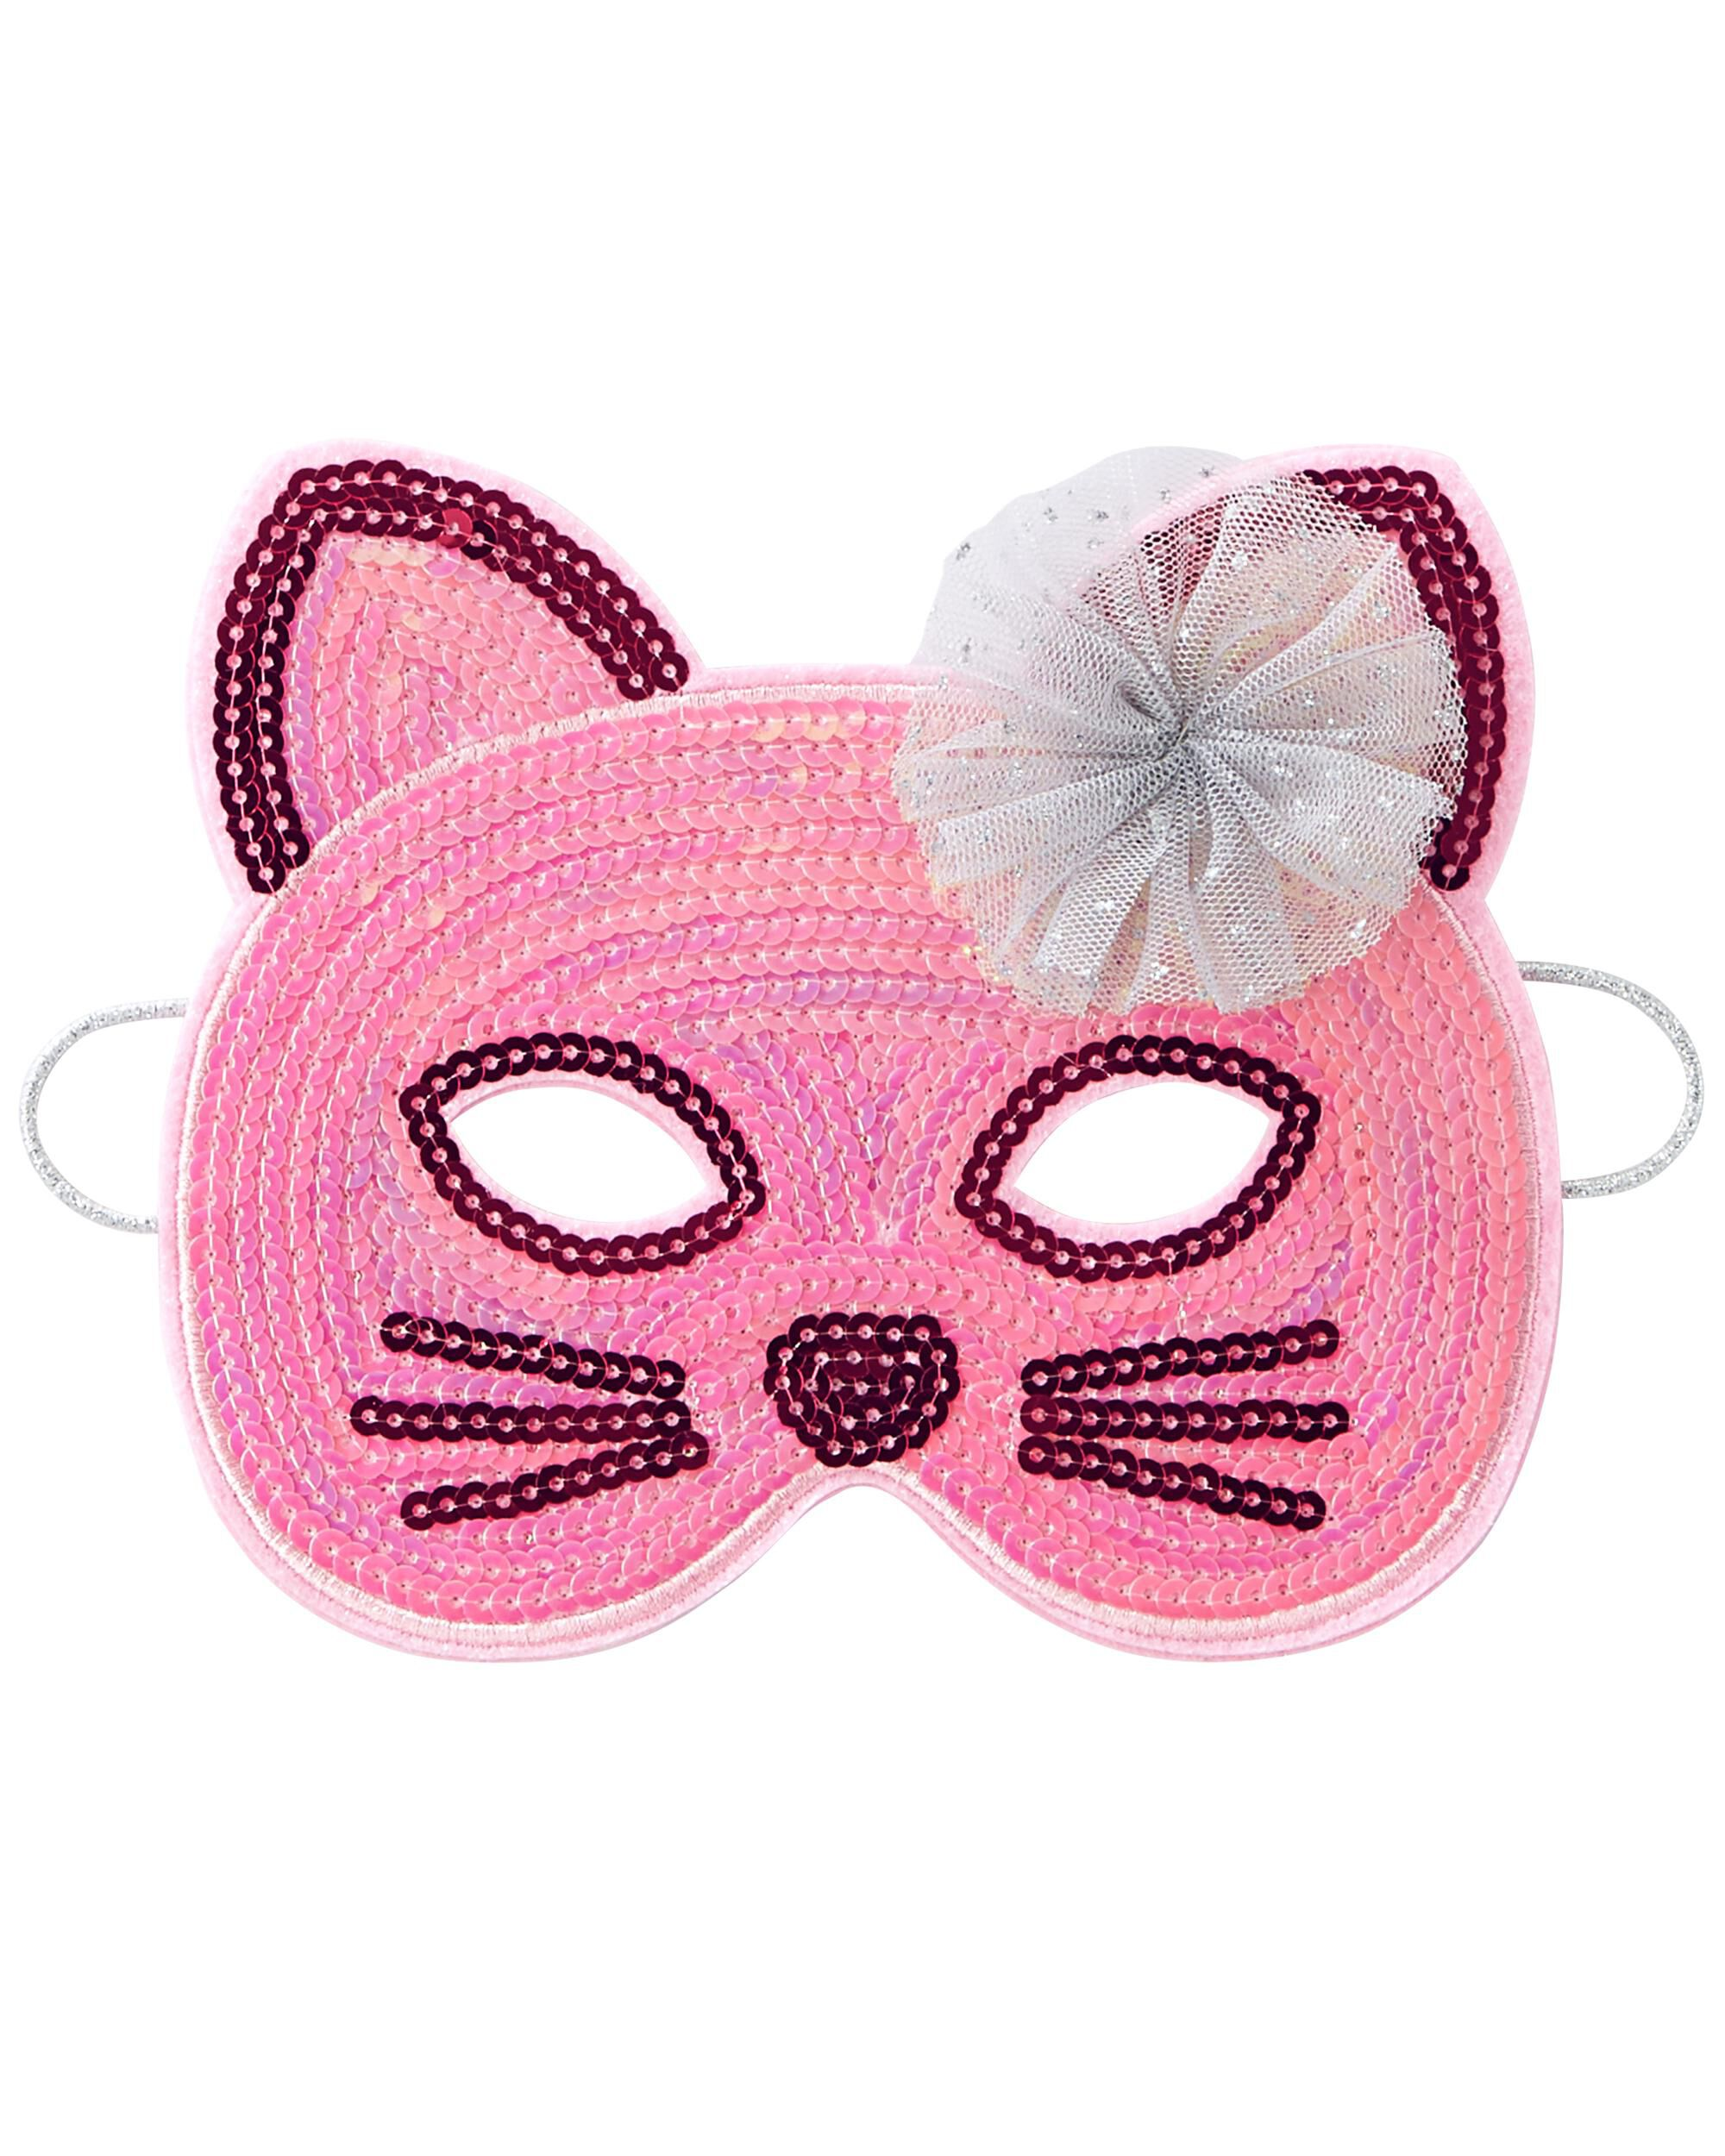 Cat Mask | OshKosh.com